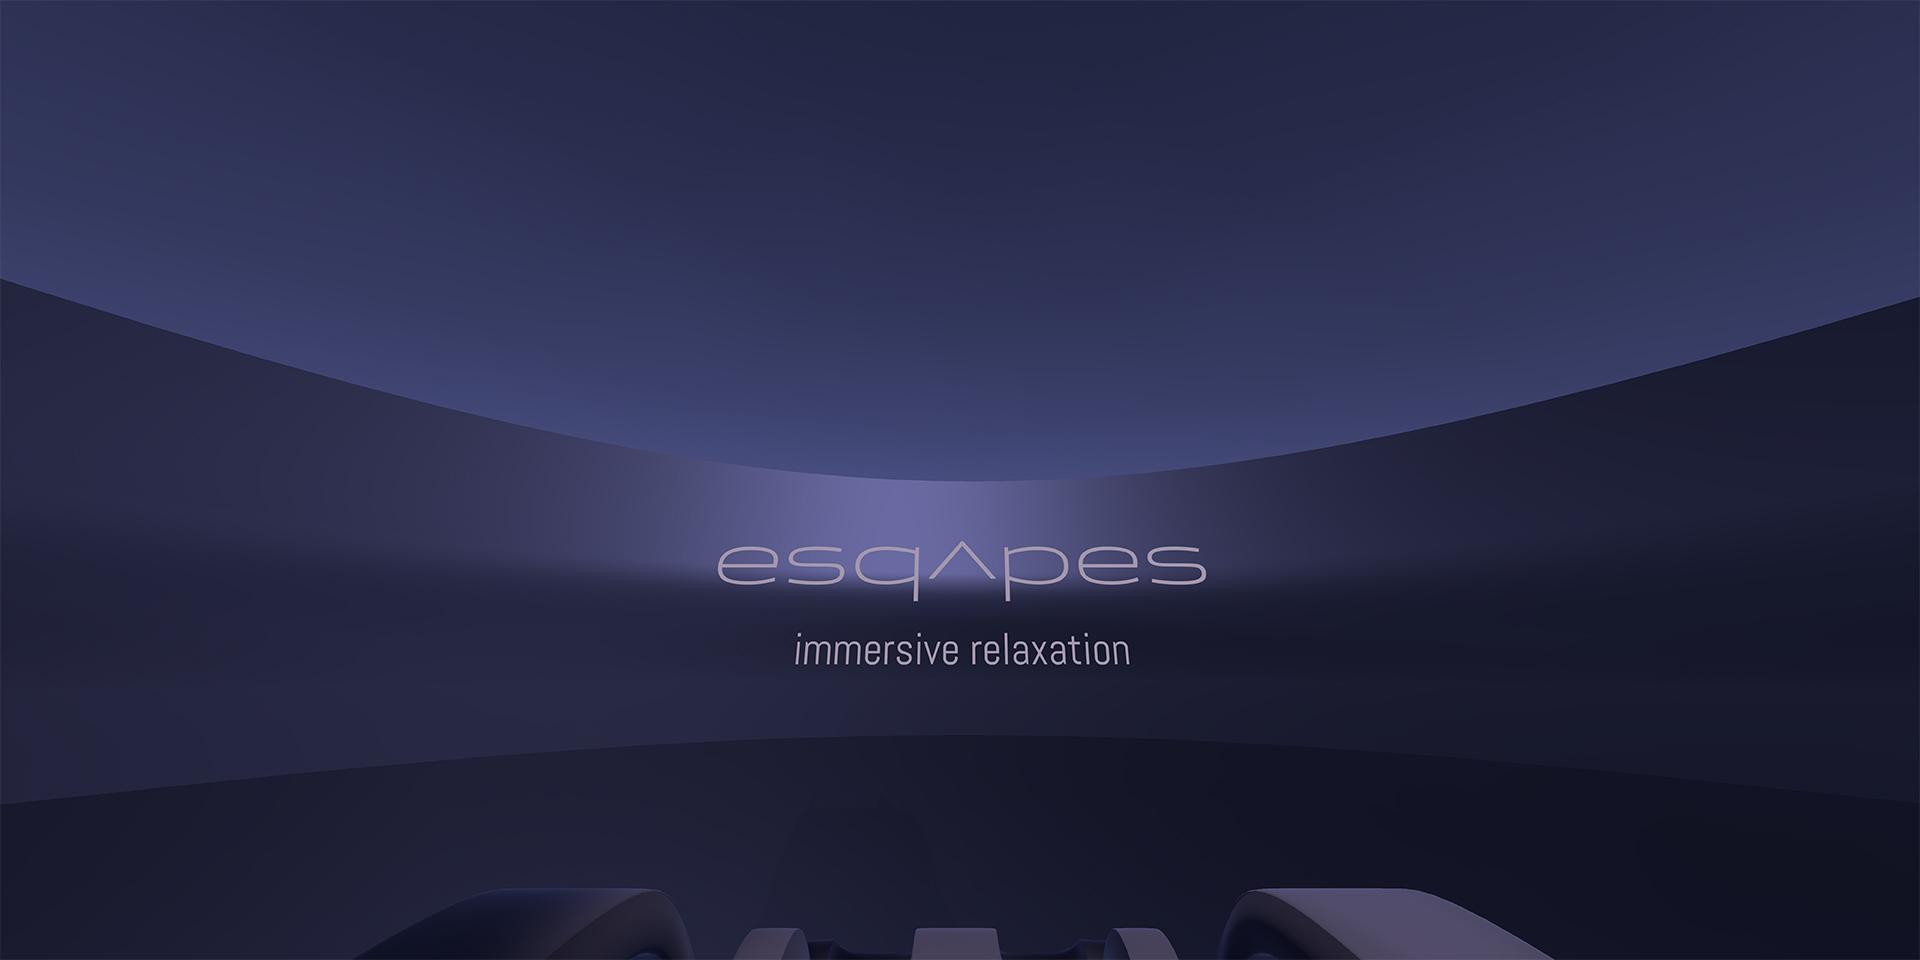 esqape_0.jpg